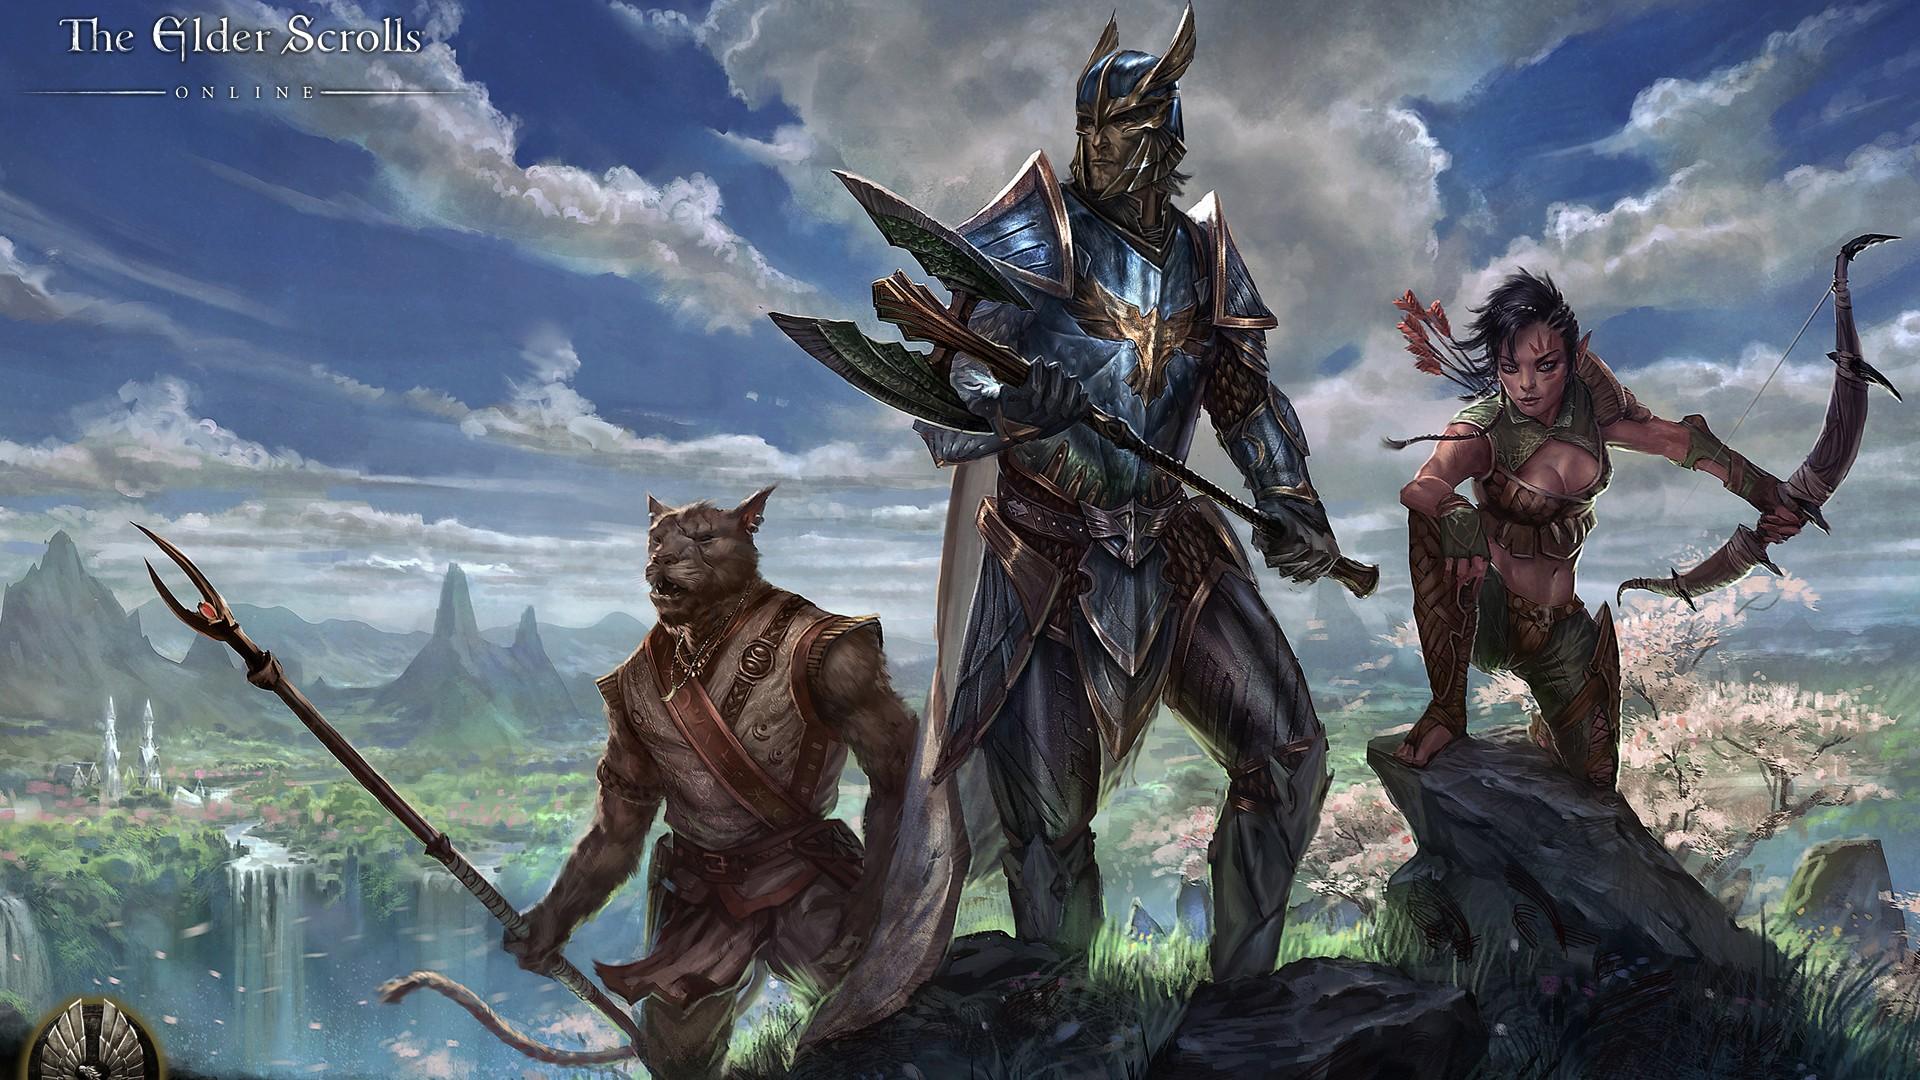 The Elder Scrolls Online wallpaper 18